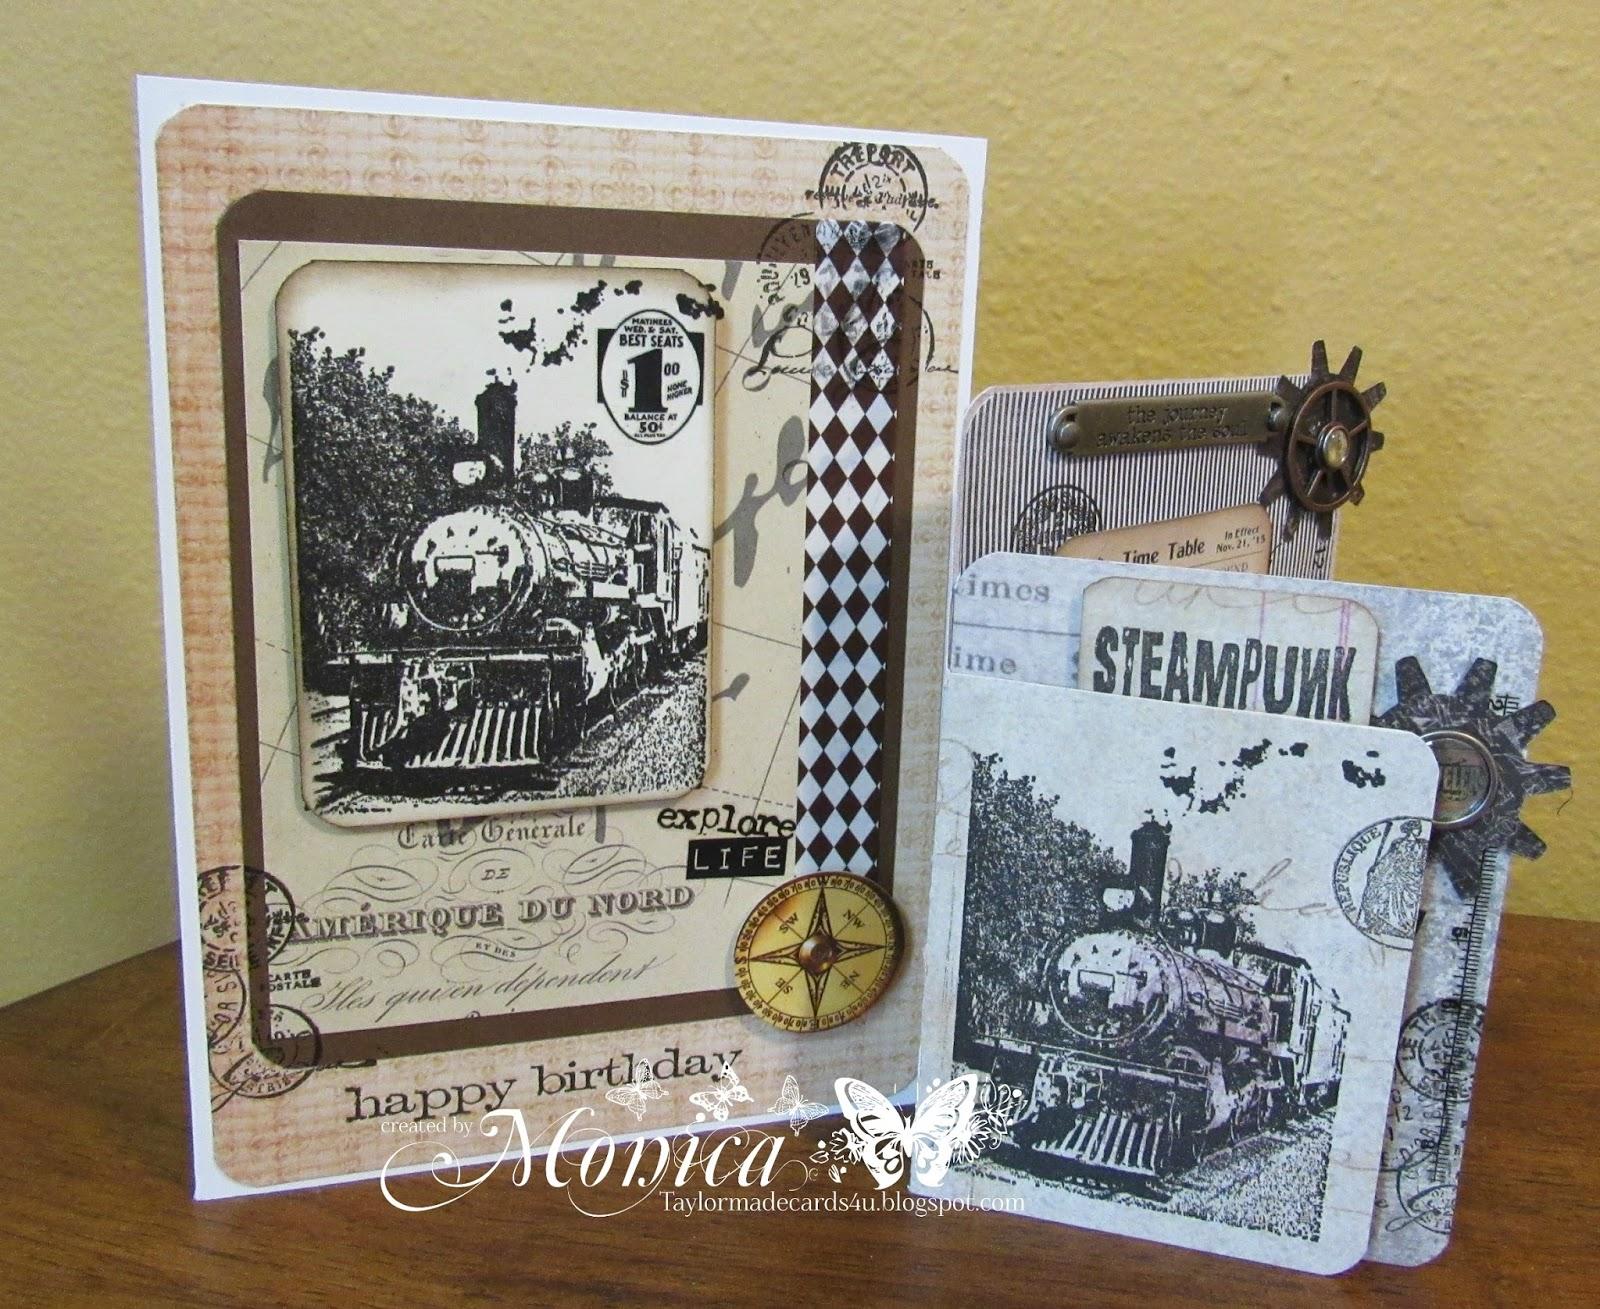 Steampunk and Passport cards – Steampunk Birthday Card